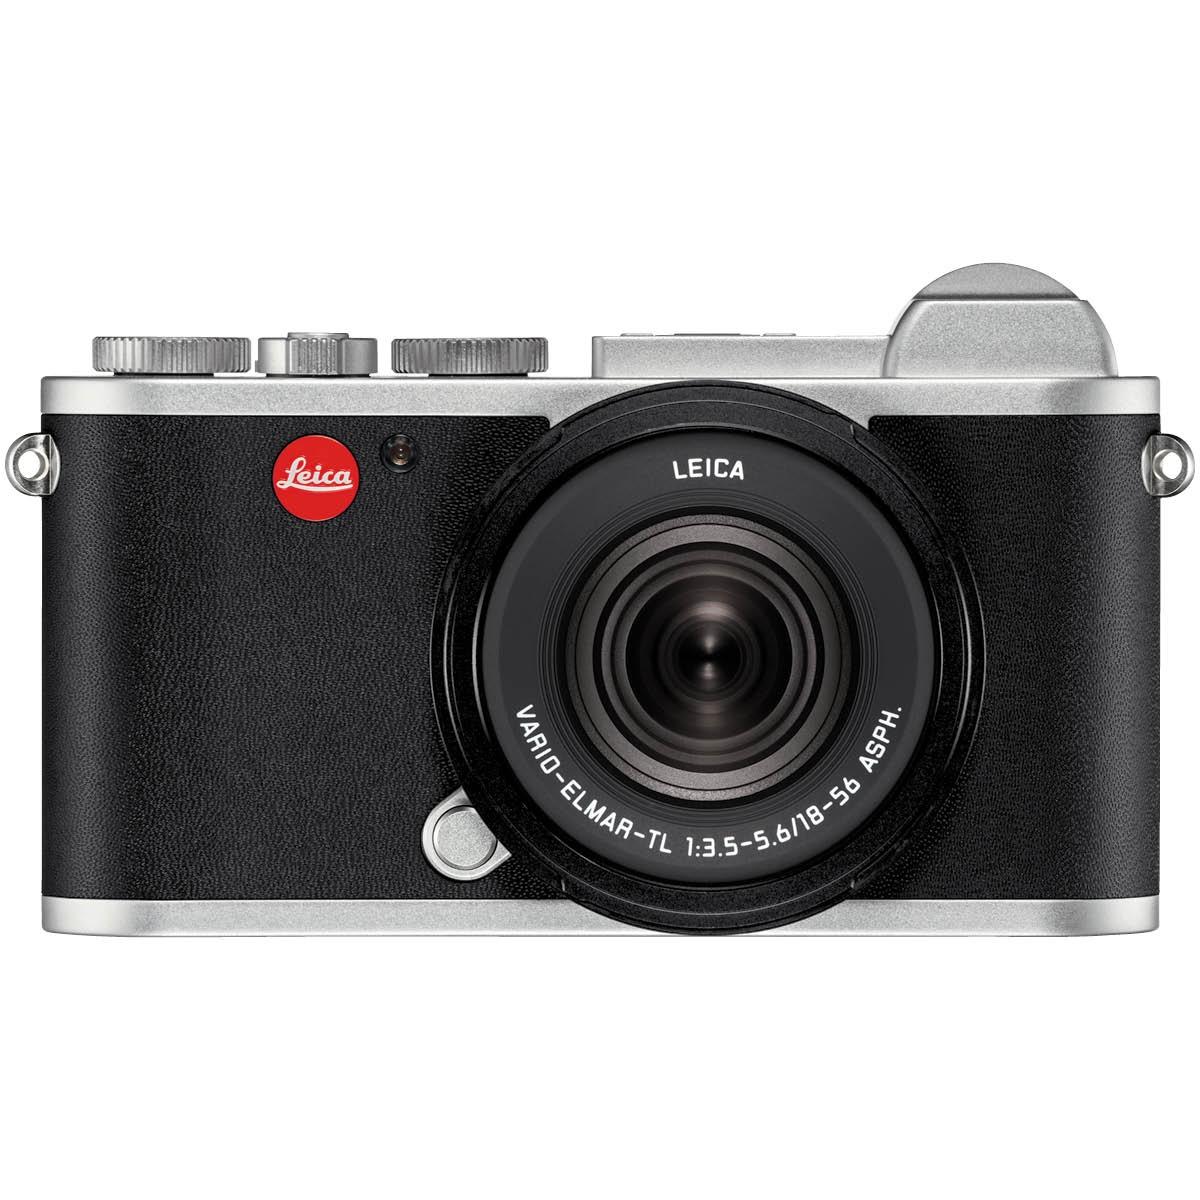 Leica CL Vario Kit mit 18-56 mm 1:3,5-5,6 Silber